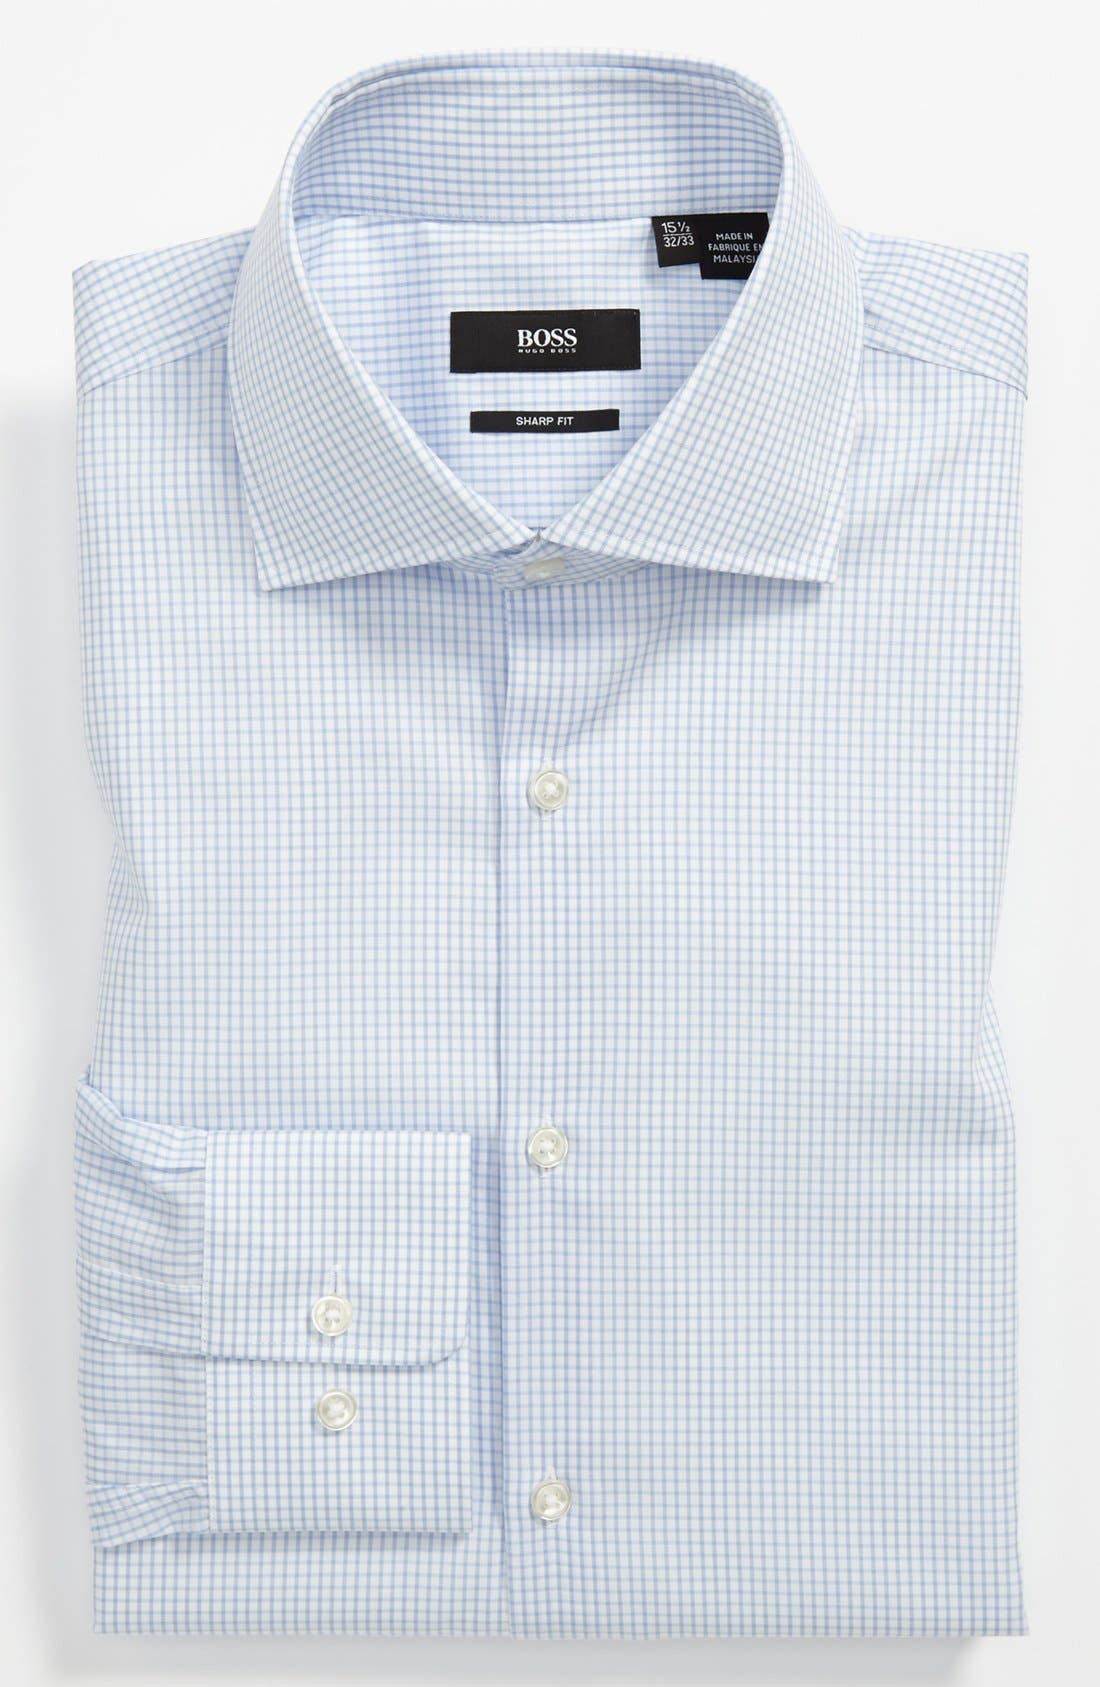 HUGO BOSS Sharp Fit Dress Shirt, Main, color, 451